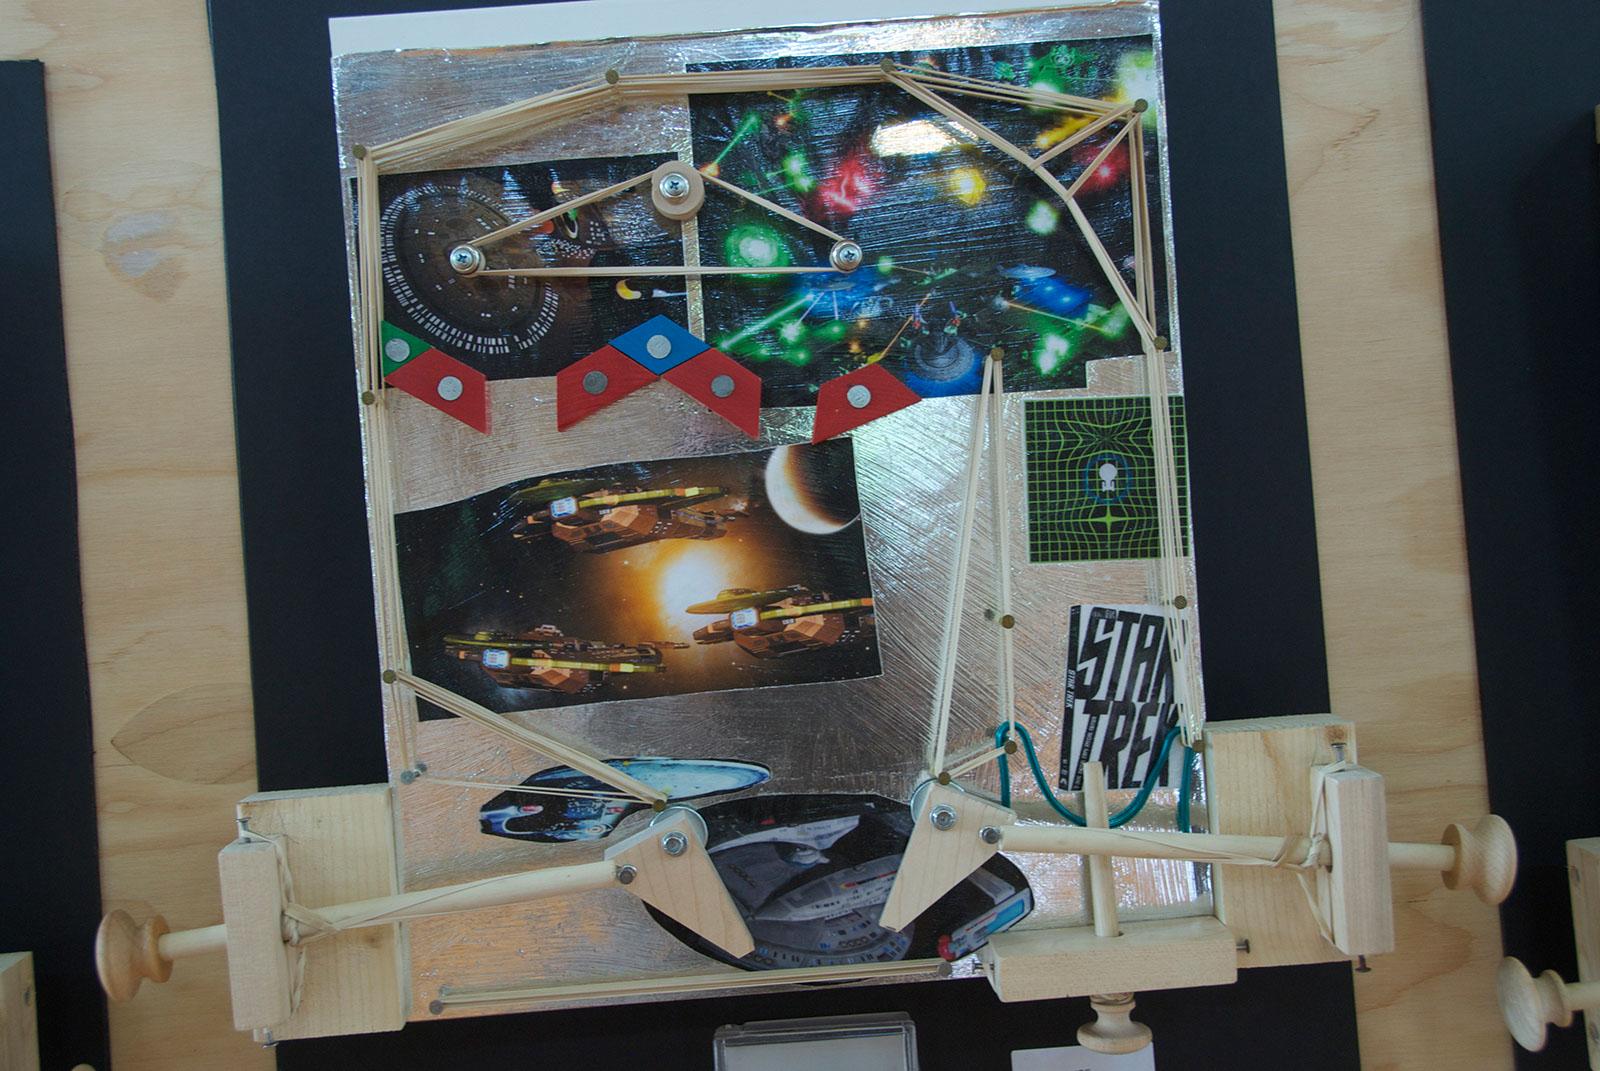 bridgefsfileVolumesUntitled 1ART Class 52012 Art Show Gallery__42.2 jpg.jpg